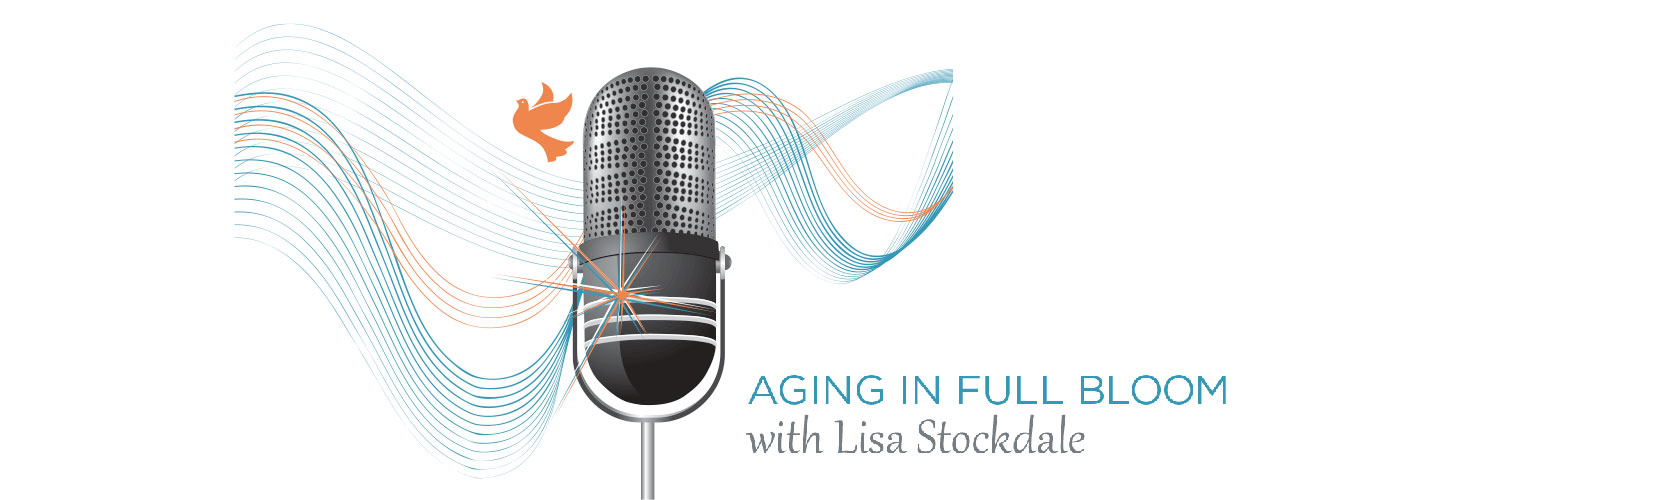 Aging in Full Bloom with Lisa Stockdale